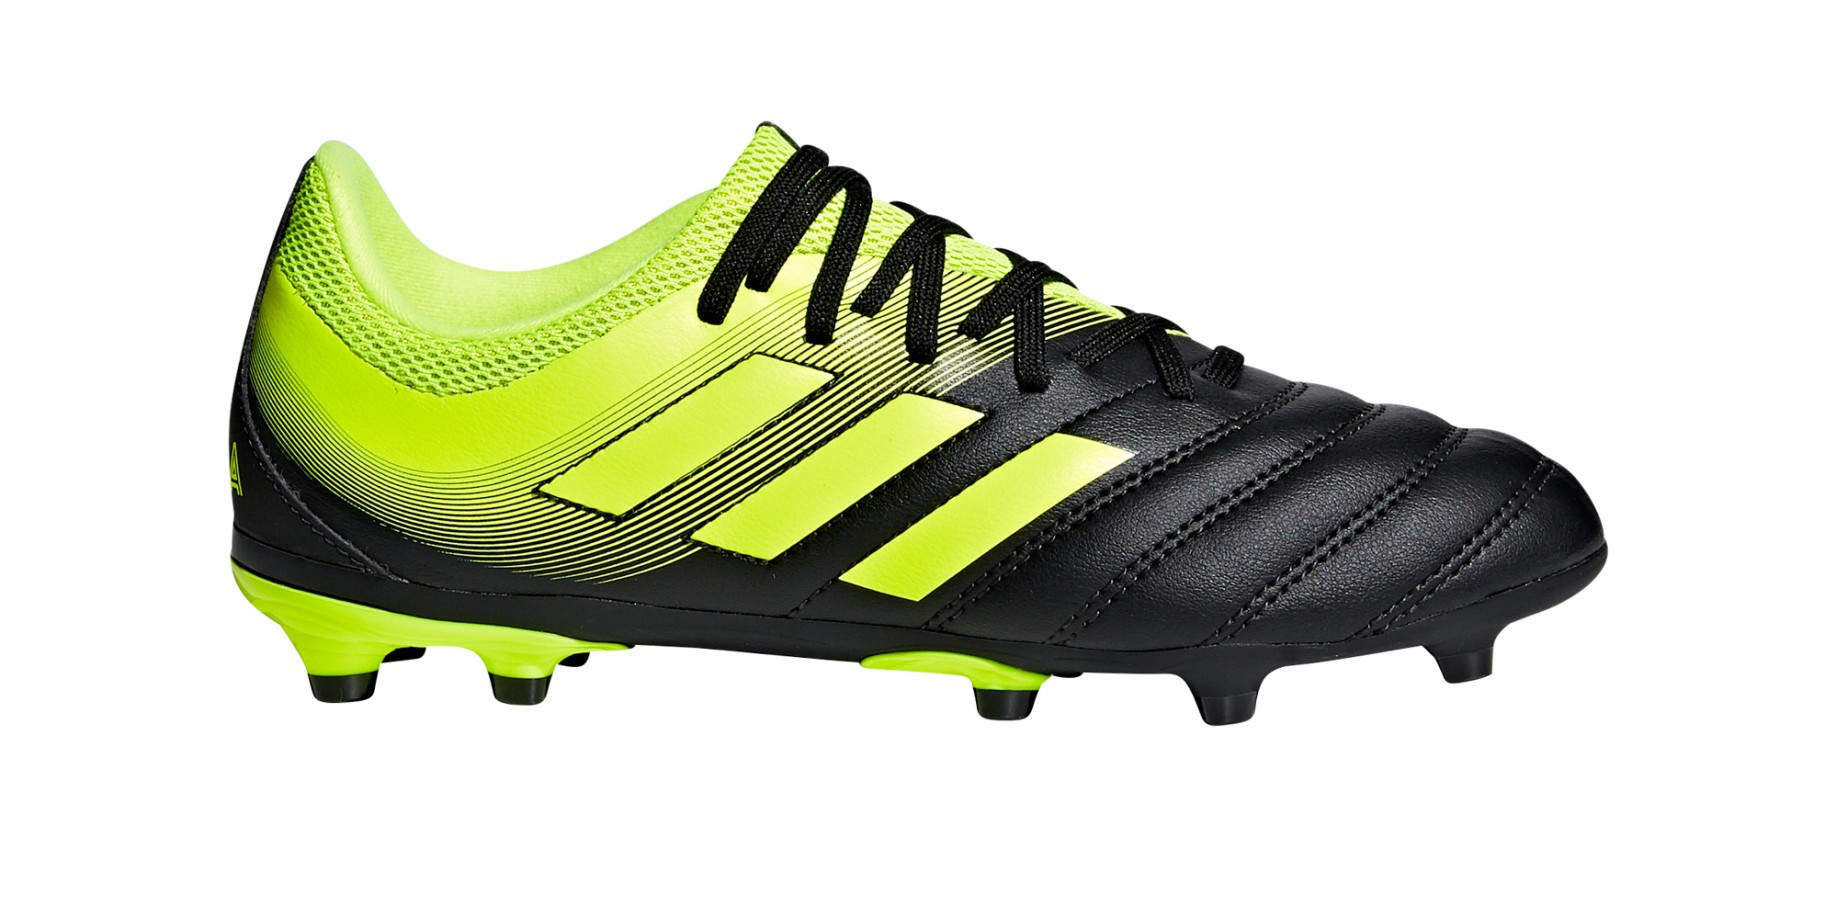 Chaussures de Football Adidas Copa 19.3 FG Exposition Pack